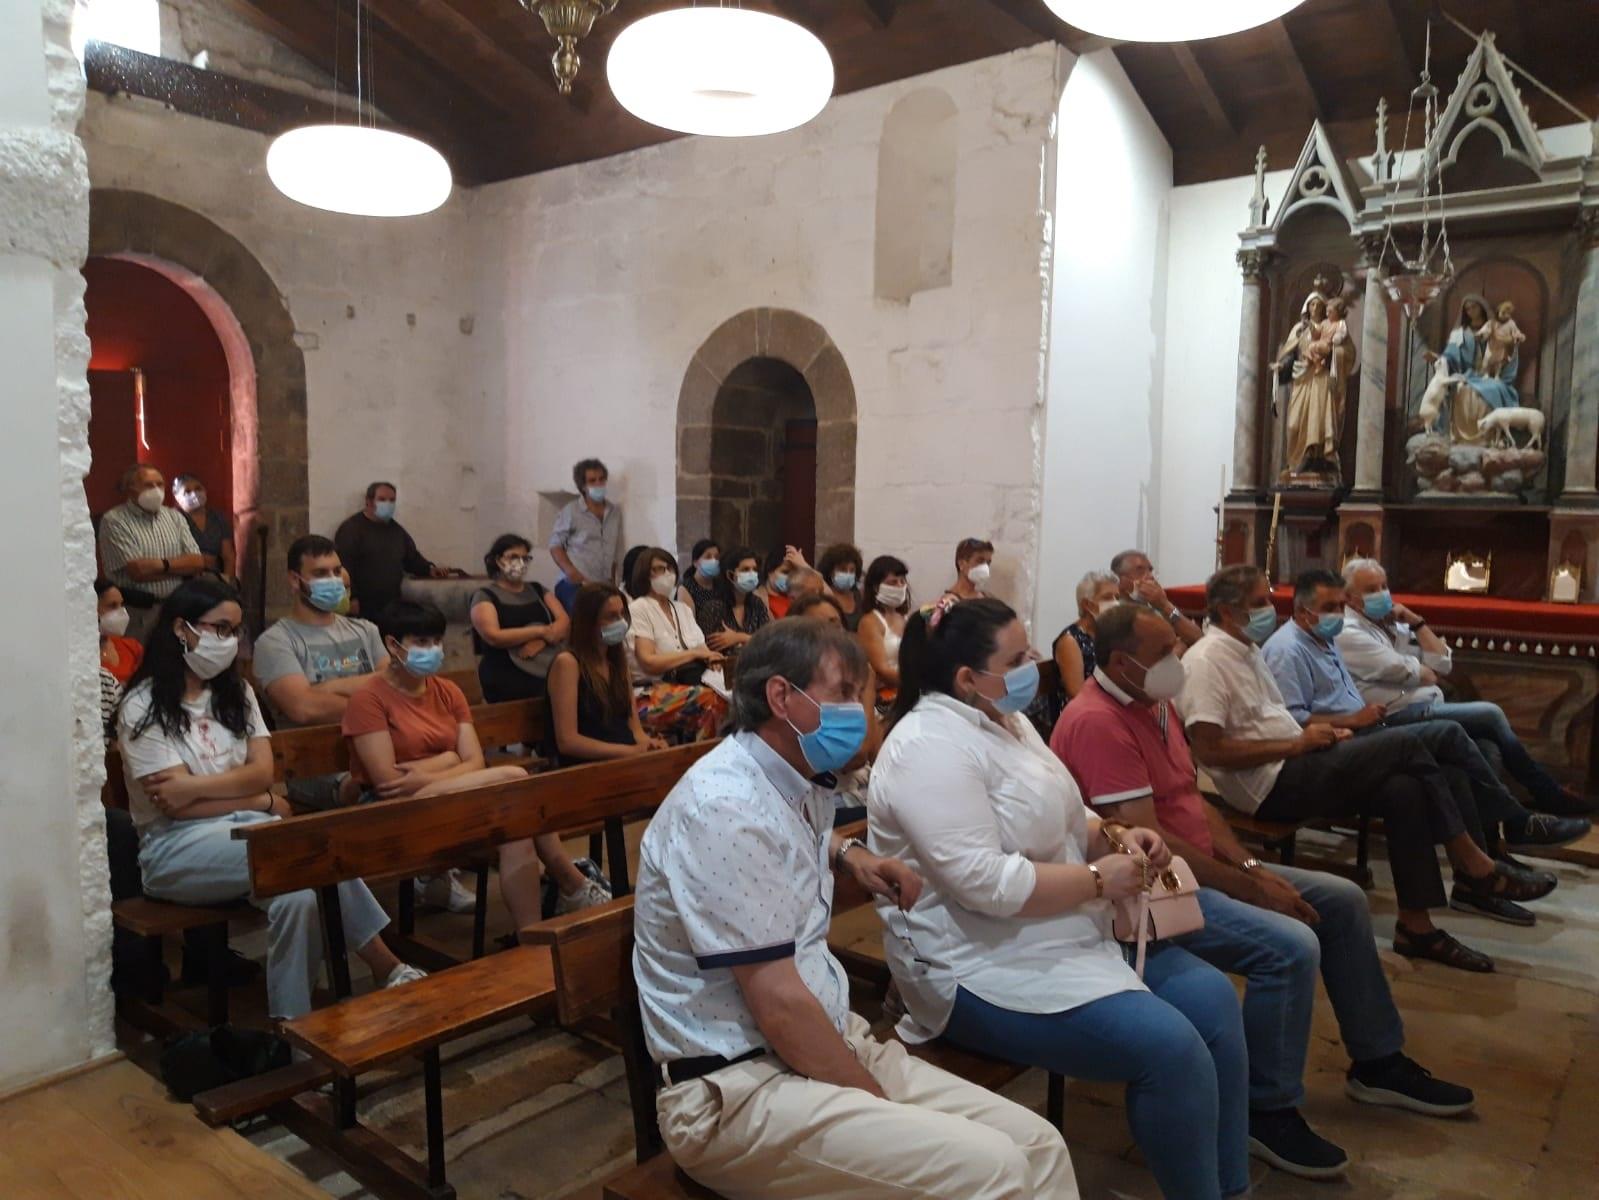 Presentación Cairón 4, Antas de Ulla, Instituto de Estudos Ulloáns, Deputación de Lugo